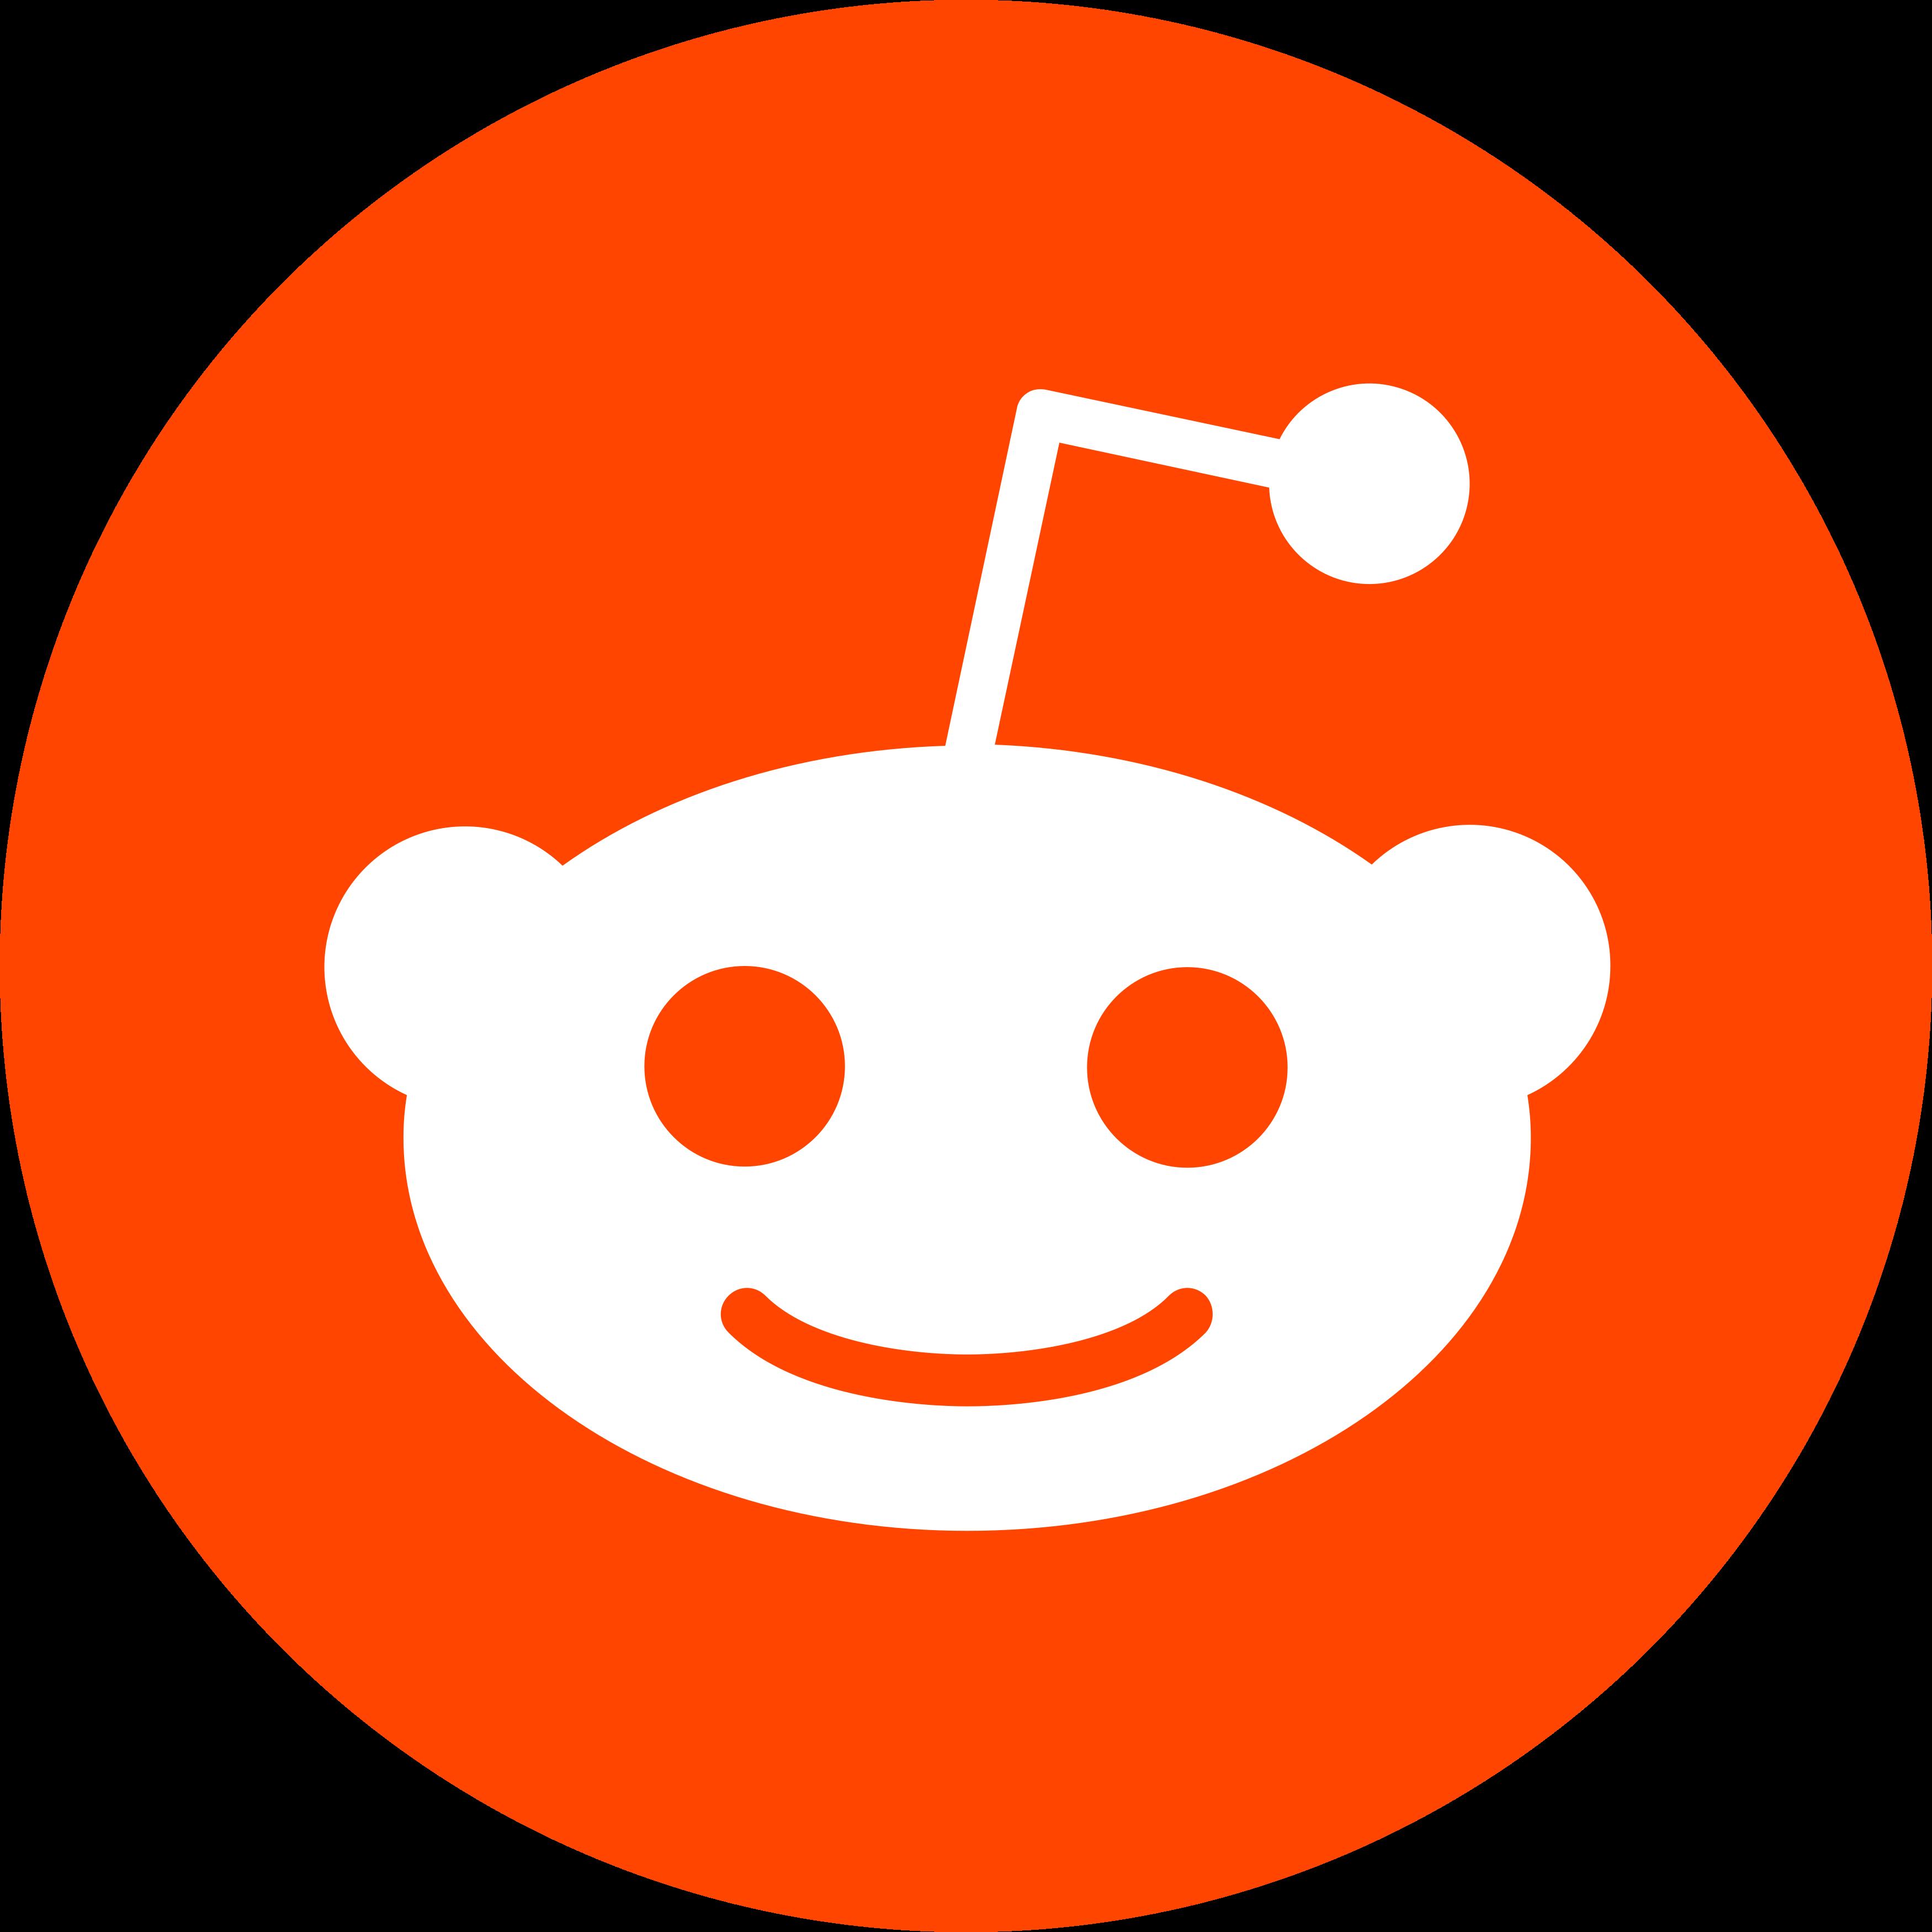 reddit logo 16 - Reddit Logo